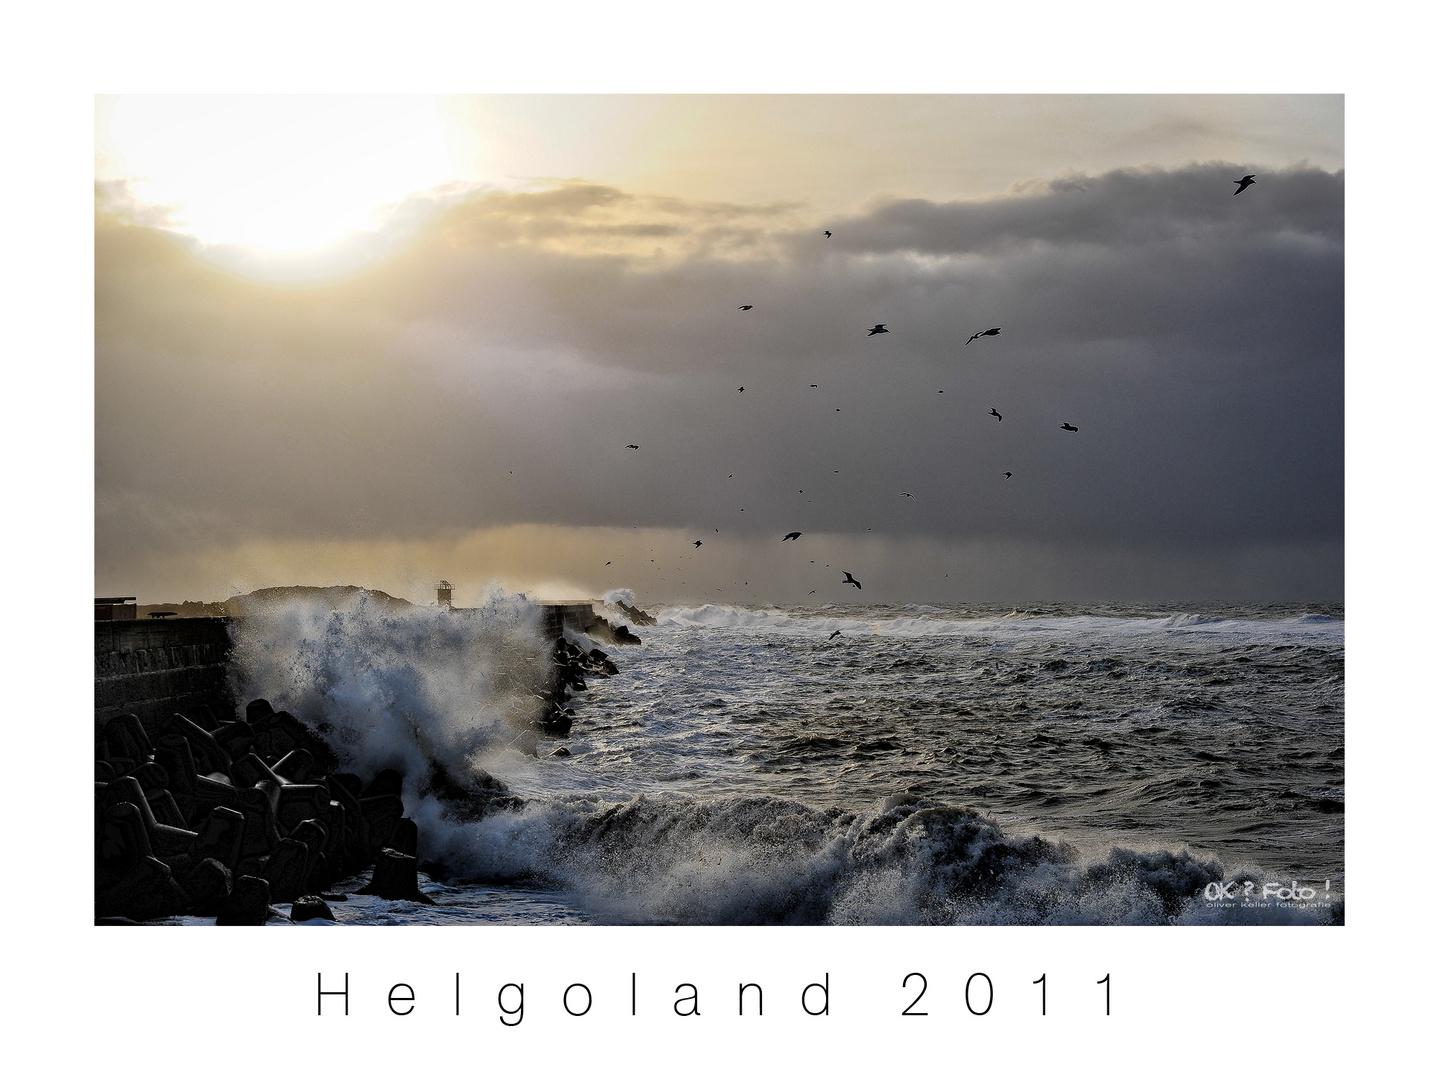 Helgoland 2011